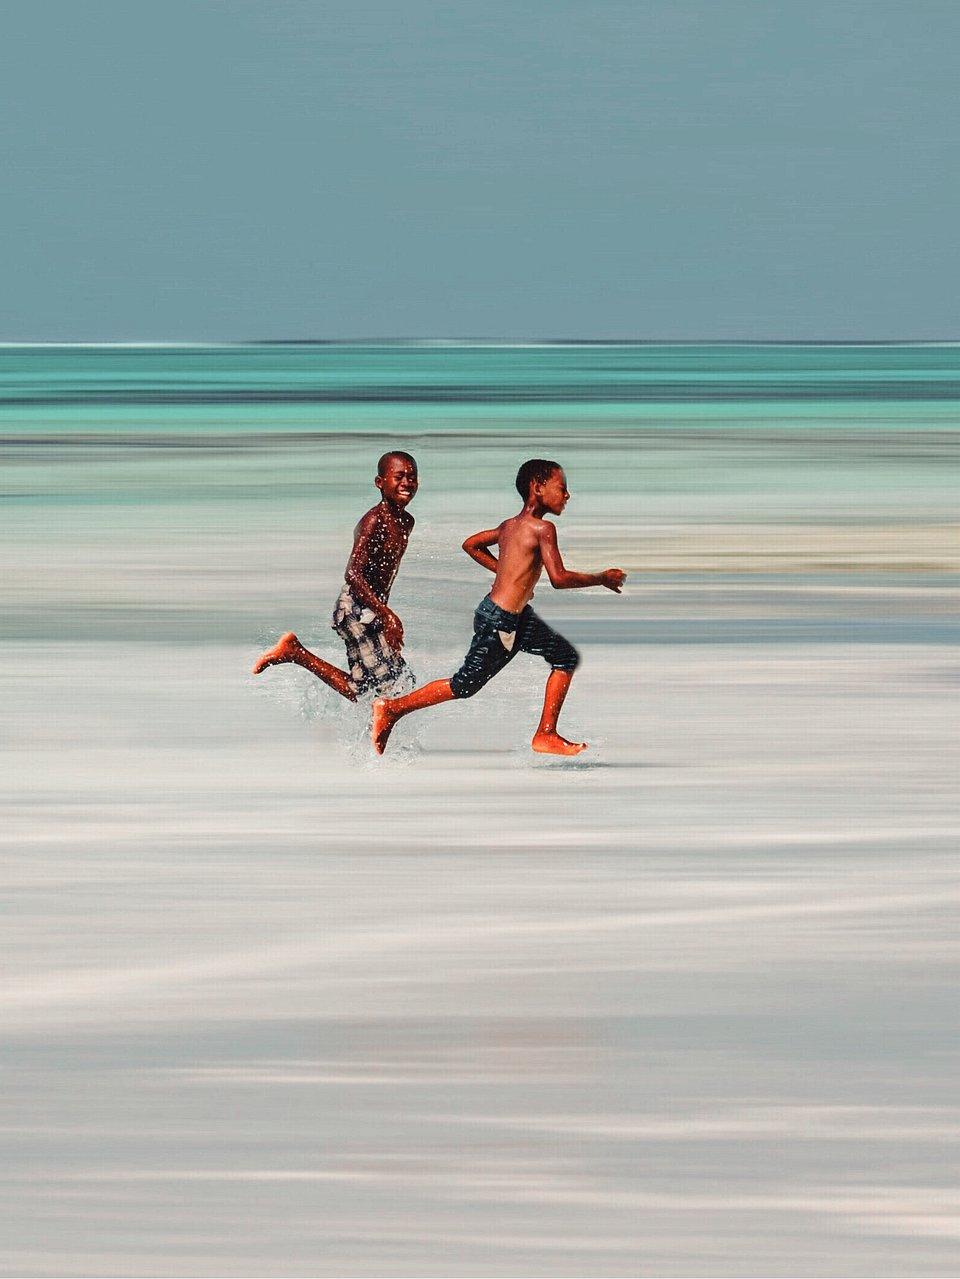 Location: Zanzibar, Tanzania